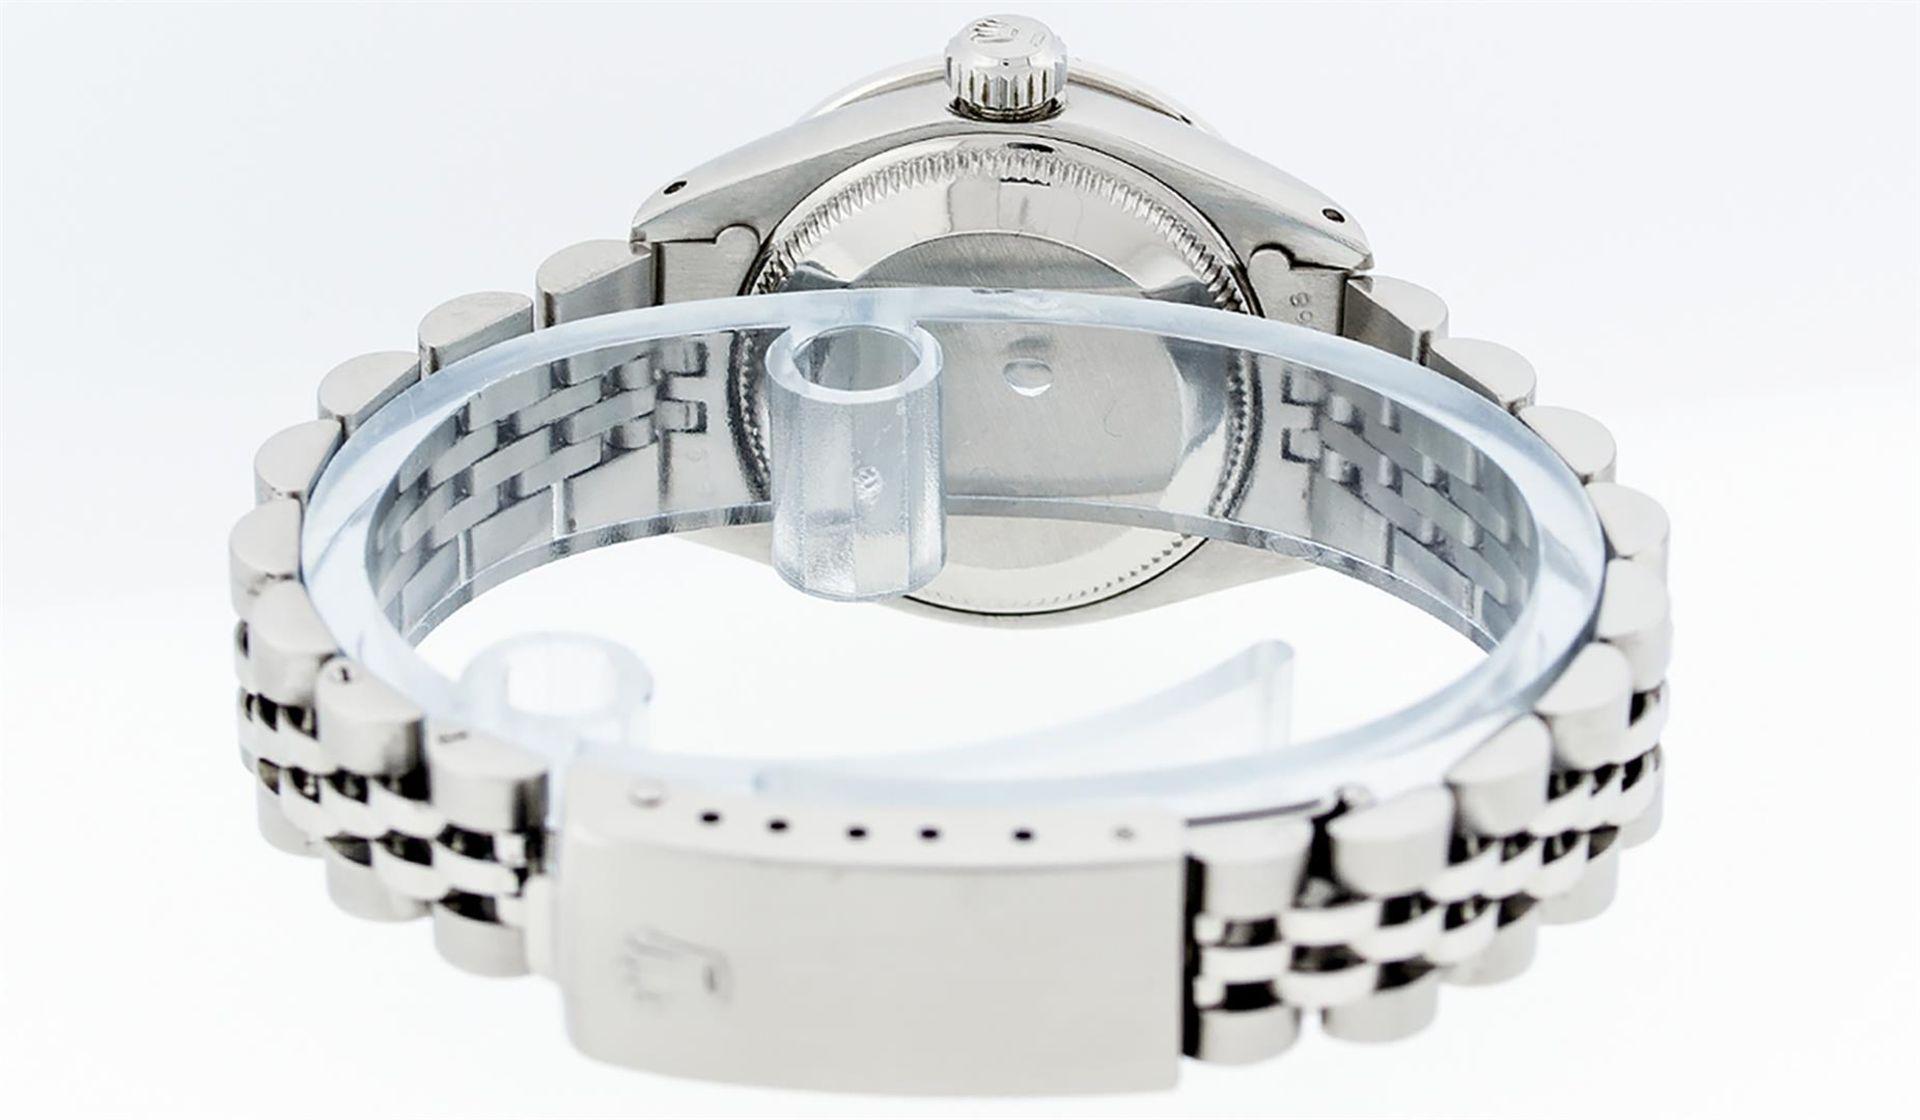 Rolex Ladies Stainless Steel MOP Diamond & Ruby 26MM Datejust Wristwatch - Image 6 of 9